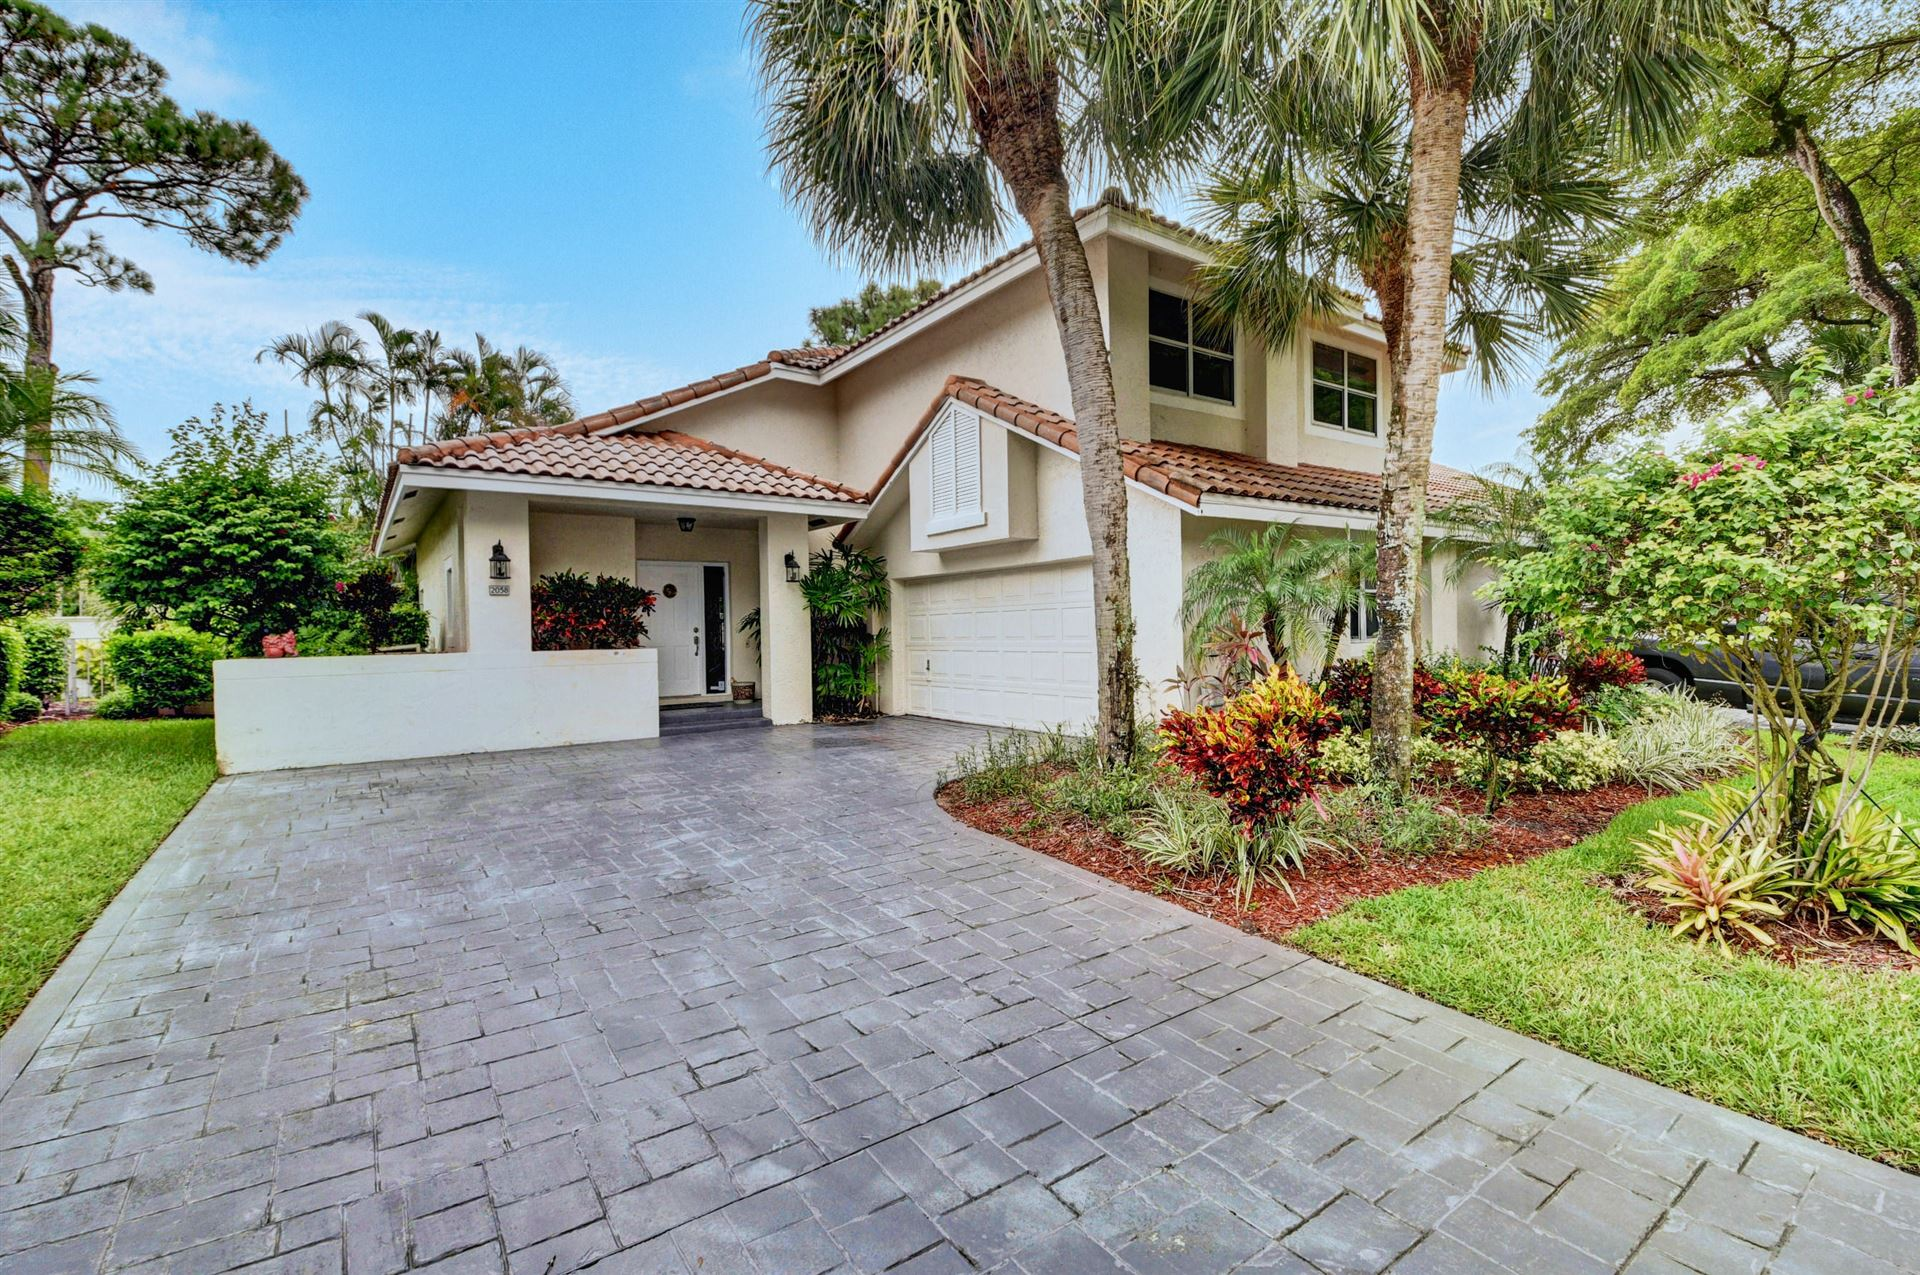 2058 NW 52nd Street, Boca Raton, FL 33496 - #: RX-10641629